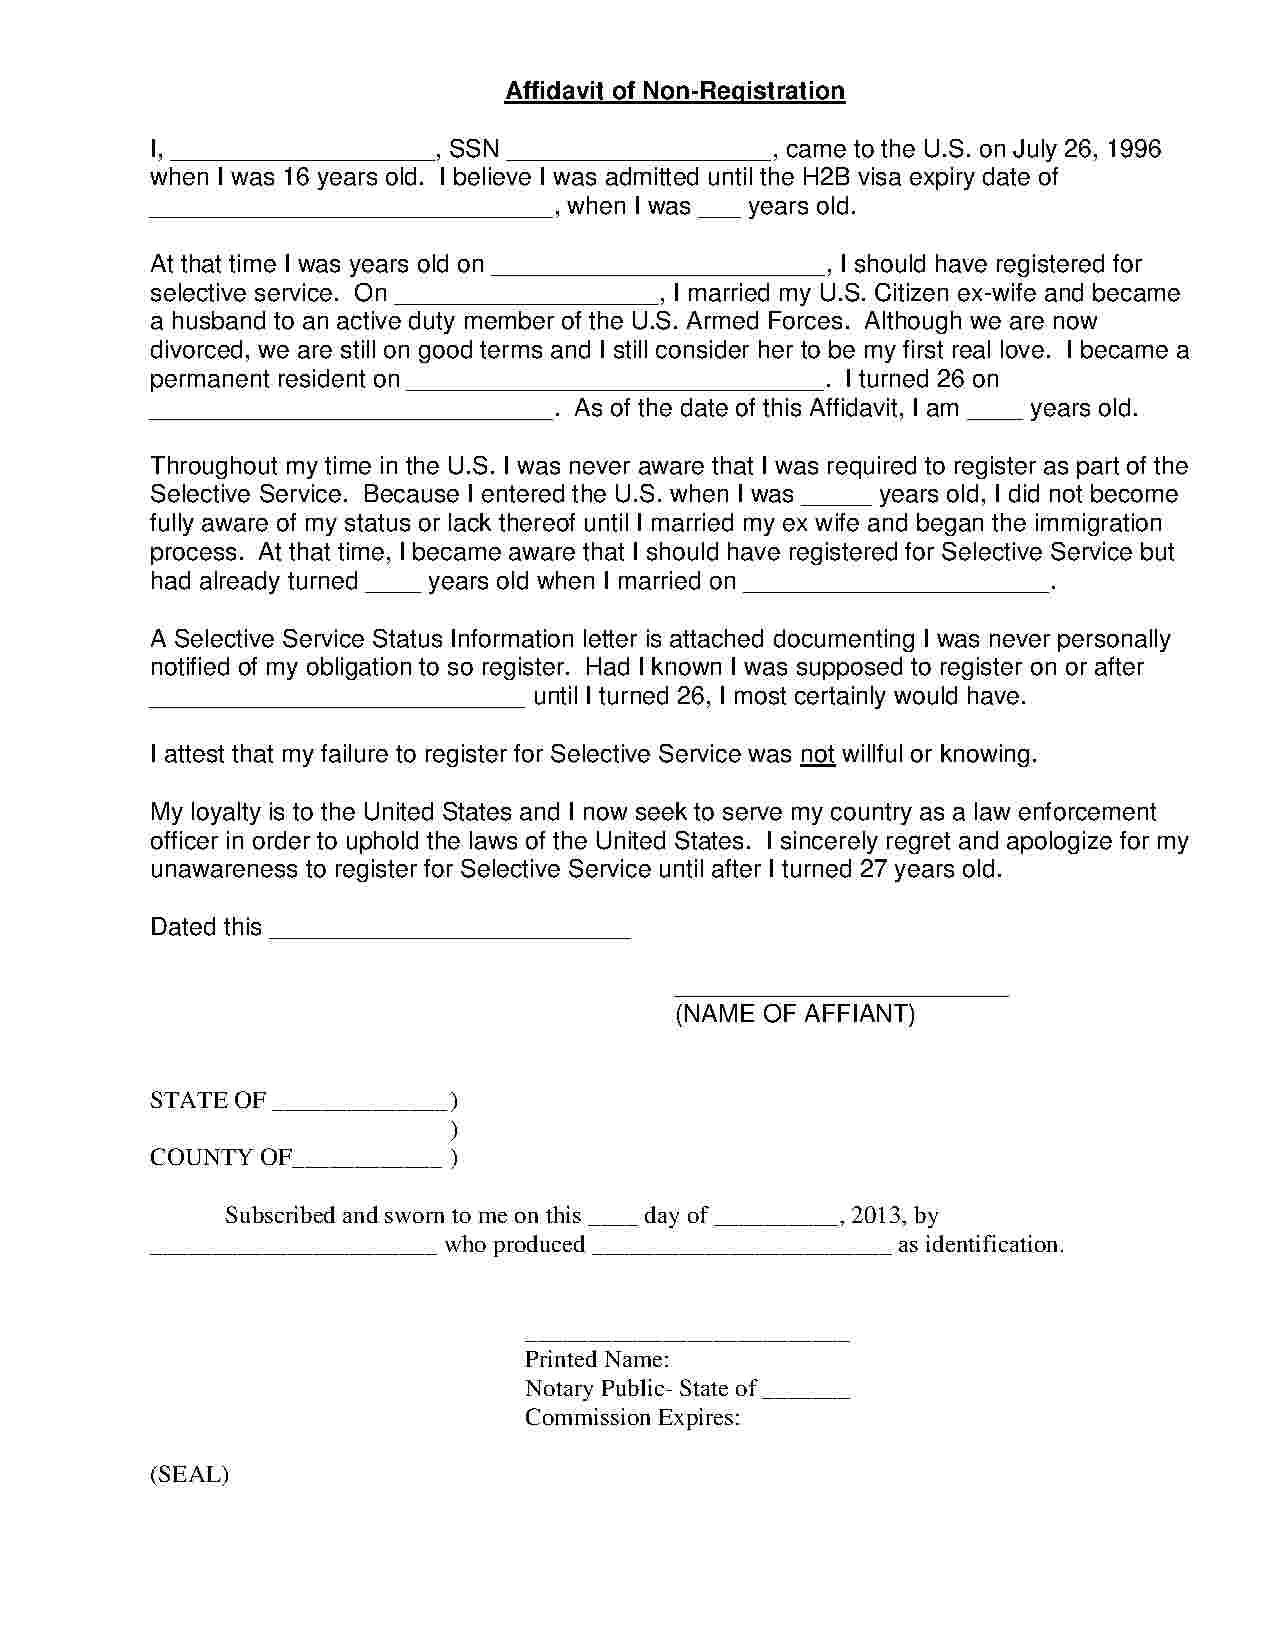 Template Of An Affidavit template affidavit form template free pics ...